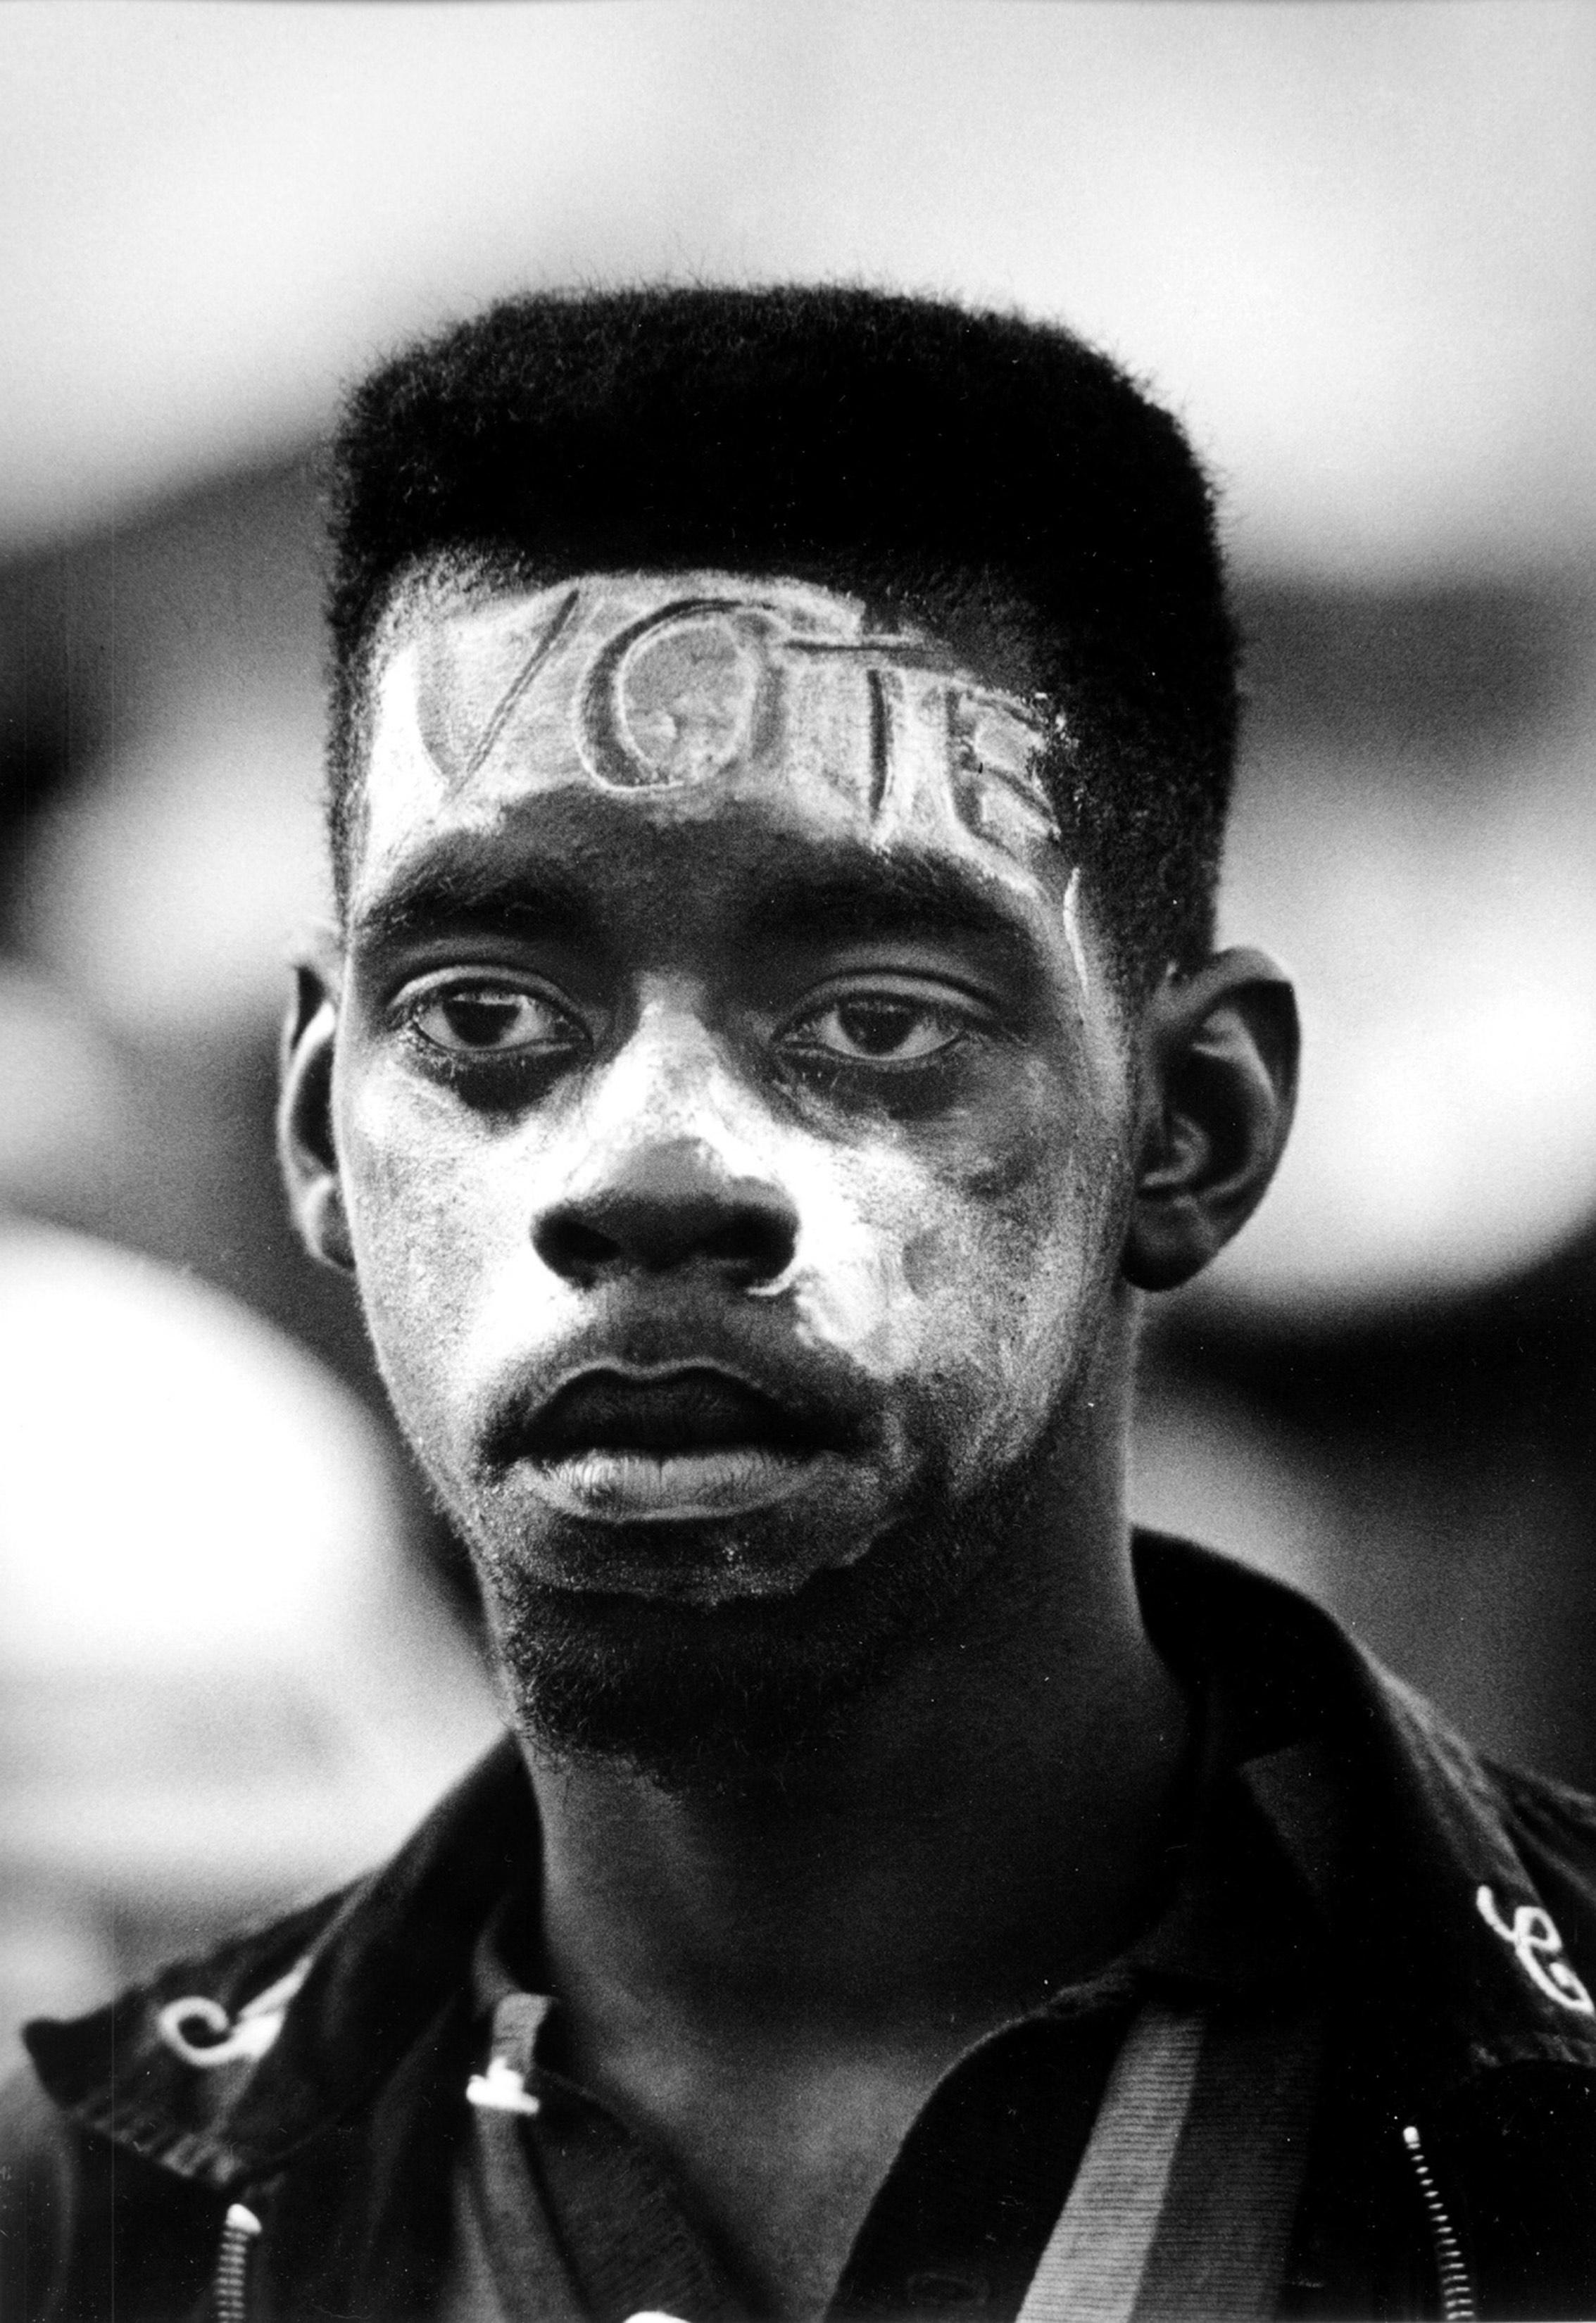 VOTE, Selma March 1965, © Steve Schapiro